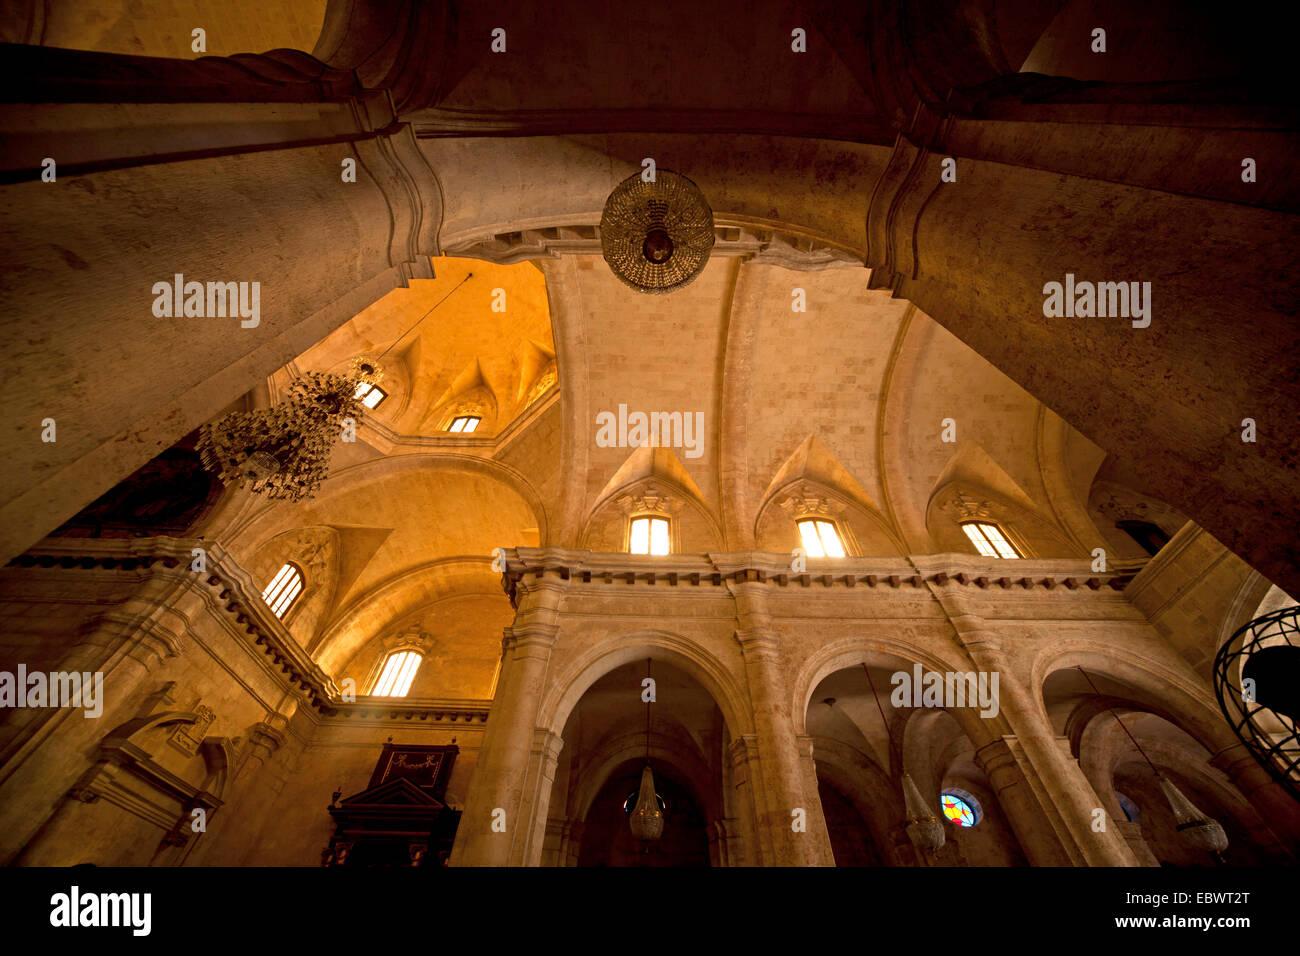 Interior de la Catedral de San Cristóbal, La Habana, Cuba Imagen De Stock